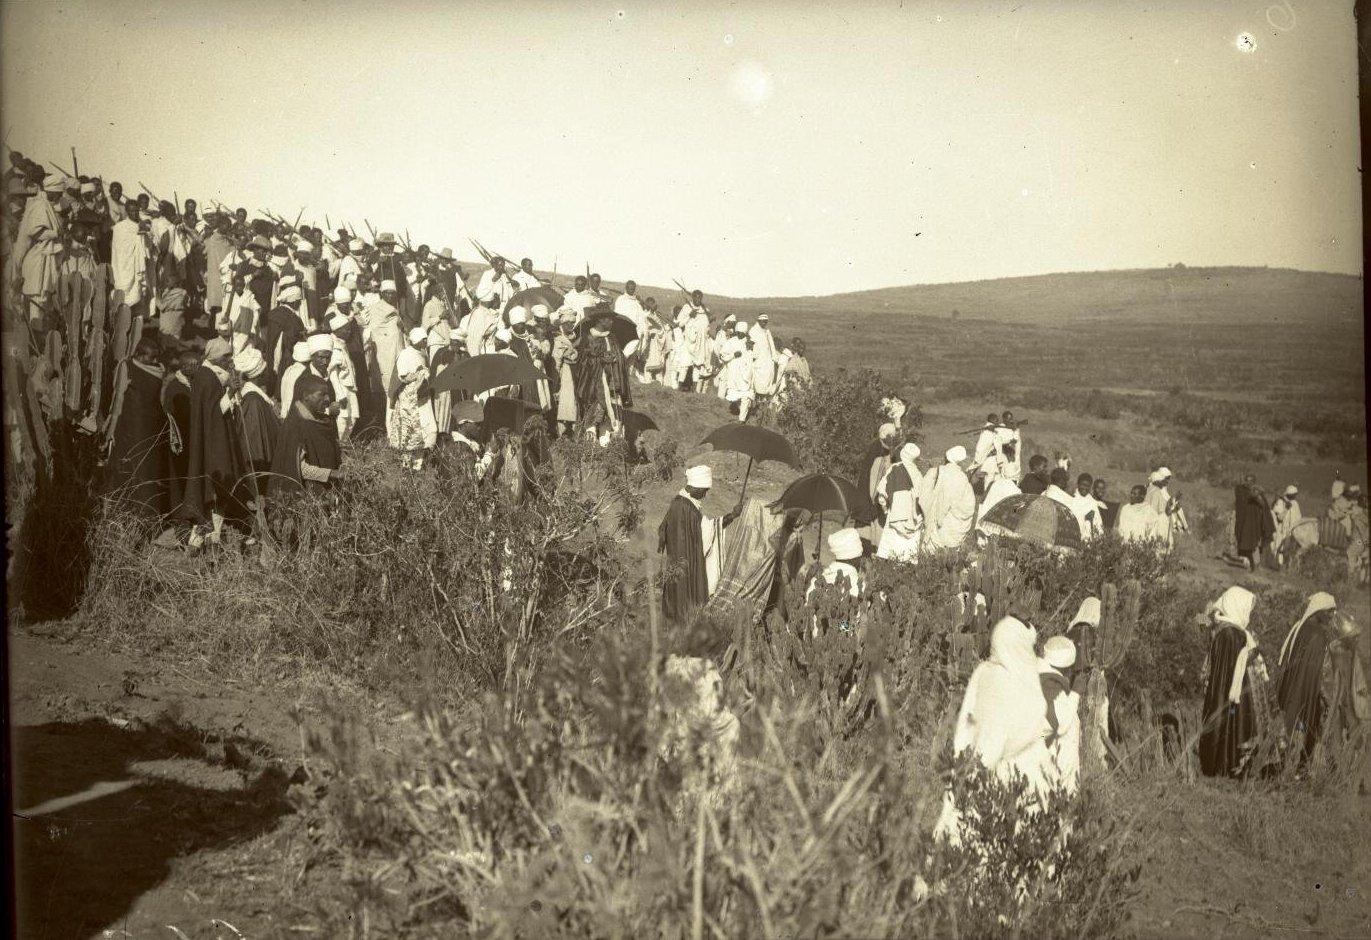 265. Абиссиния, провинция Харар, г. Харар. Крестный ход